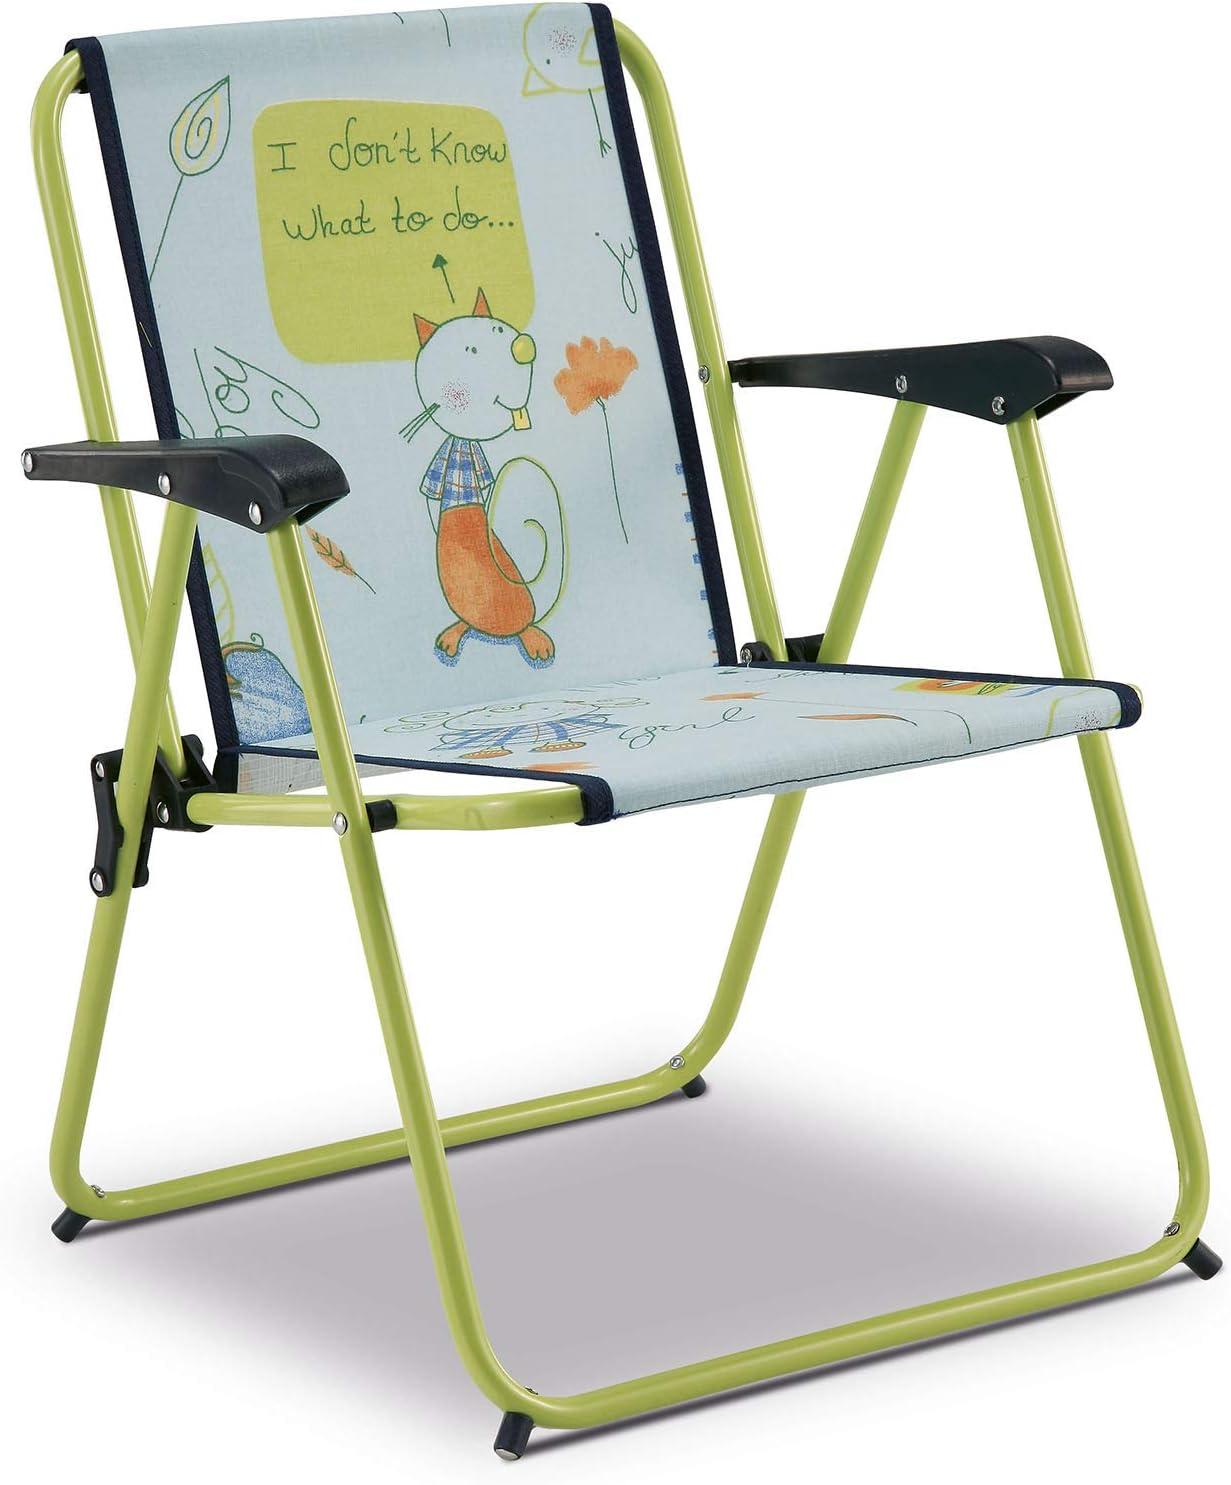 Solenny 50001001155274 - Silla Infantil Fijo Acolchado 2 cm